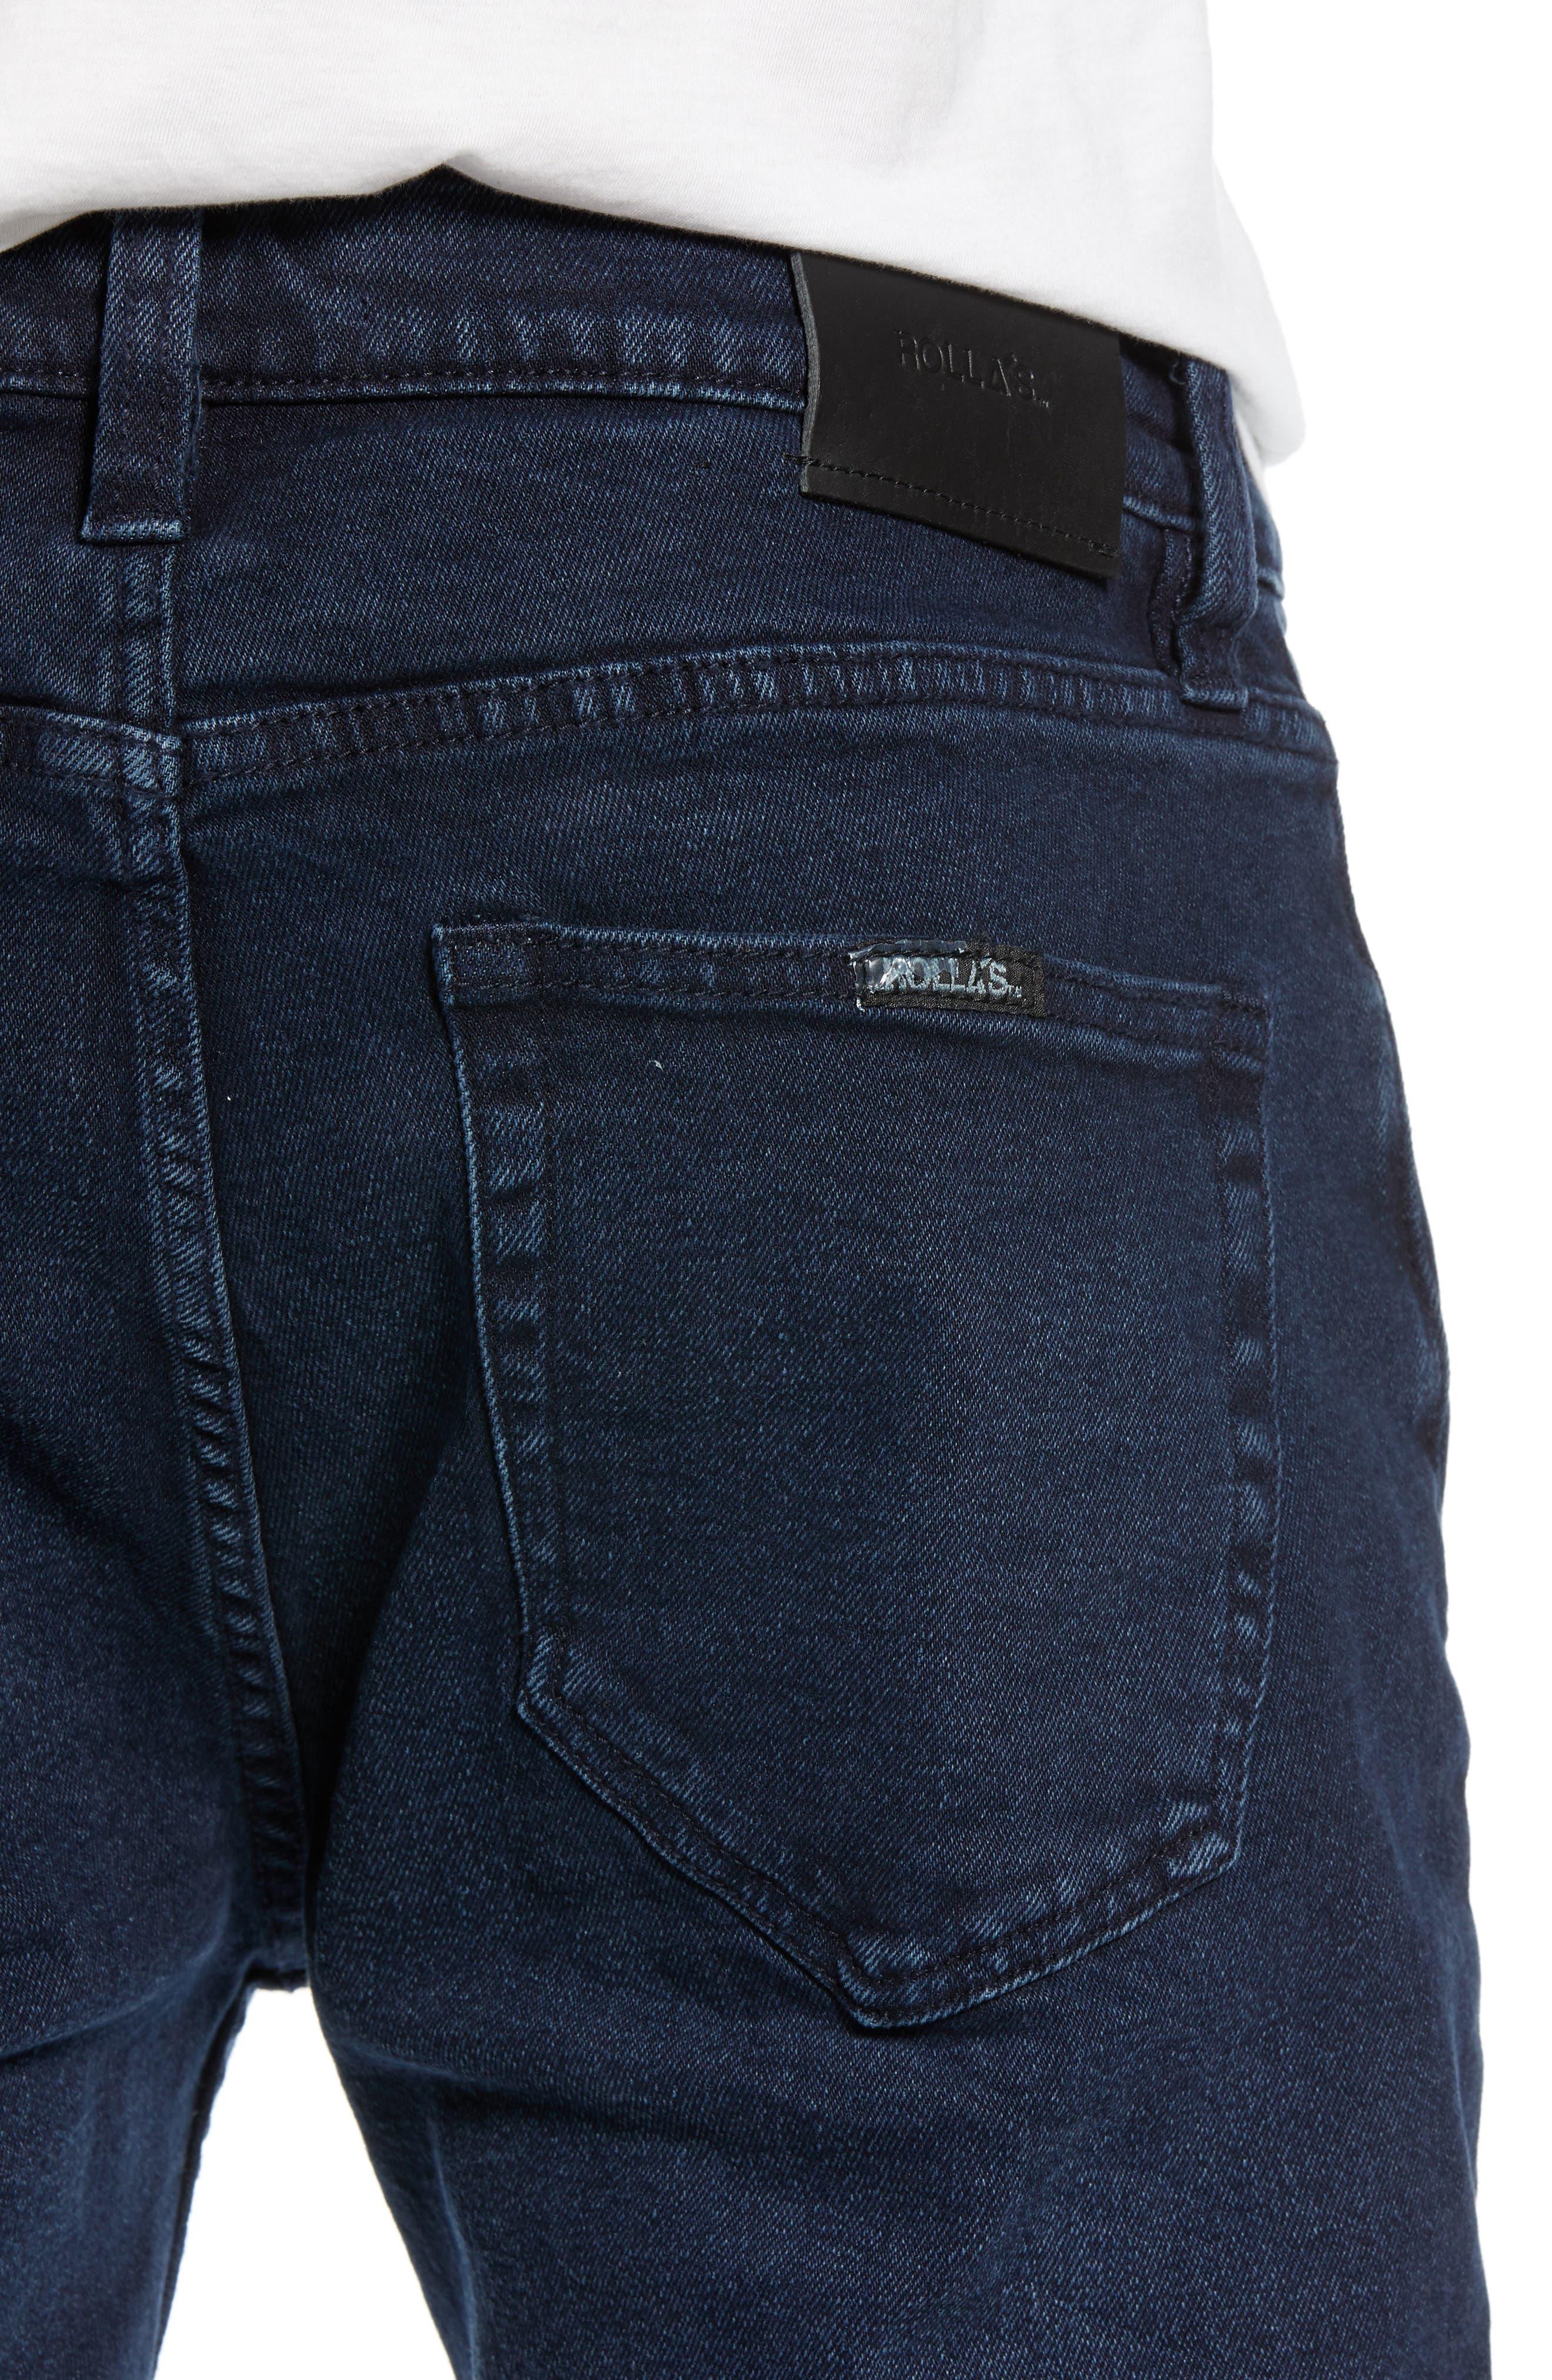 Stinger Skinny Fit Jeans,                             Alternate thumbnail 4, color,                             STONE FREE BLUE